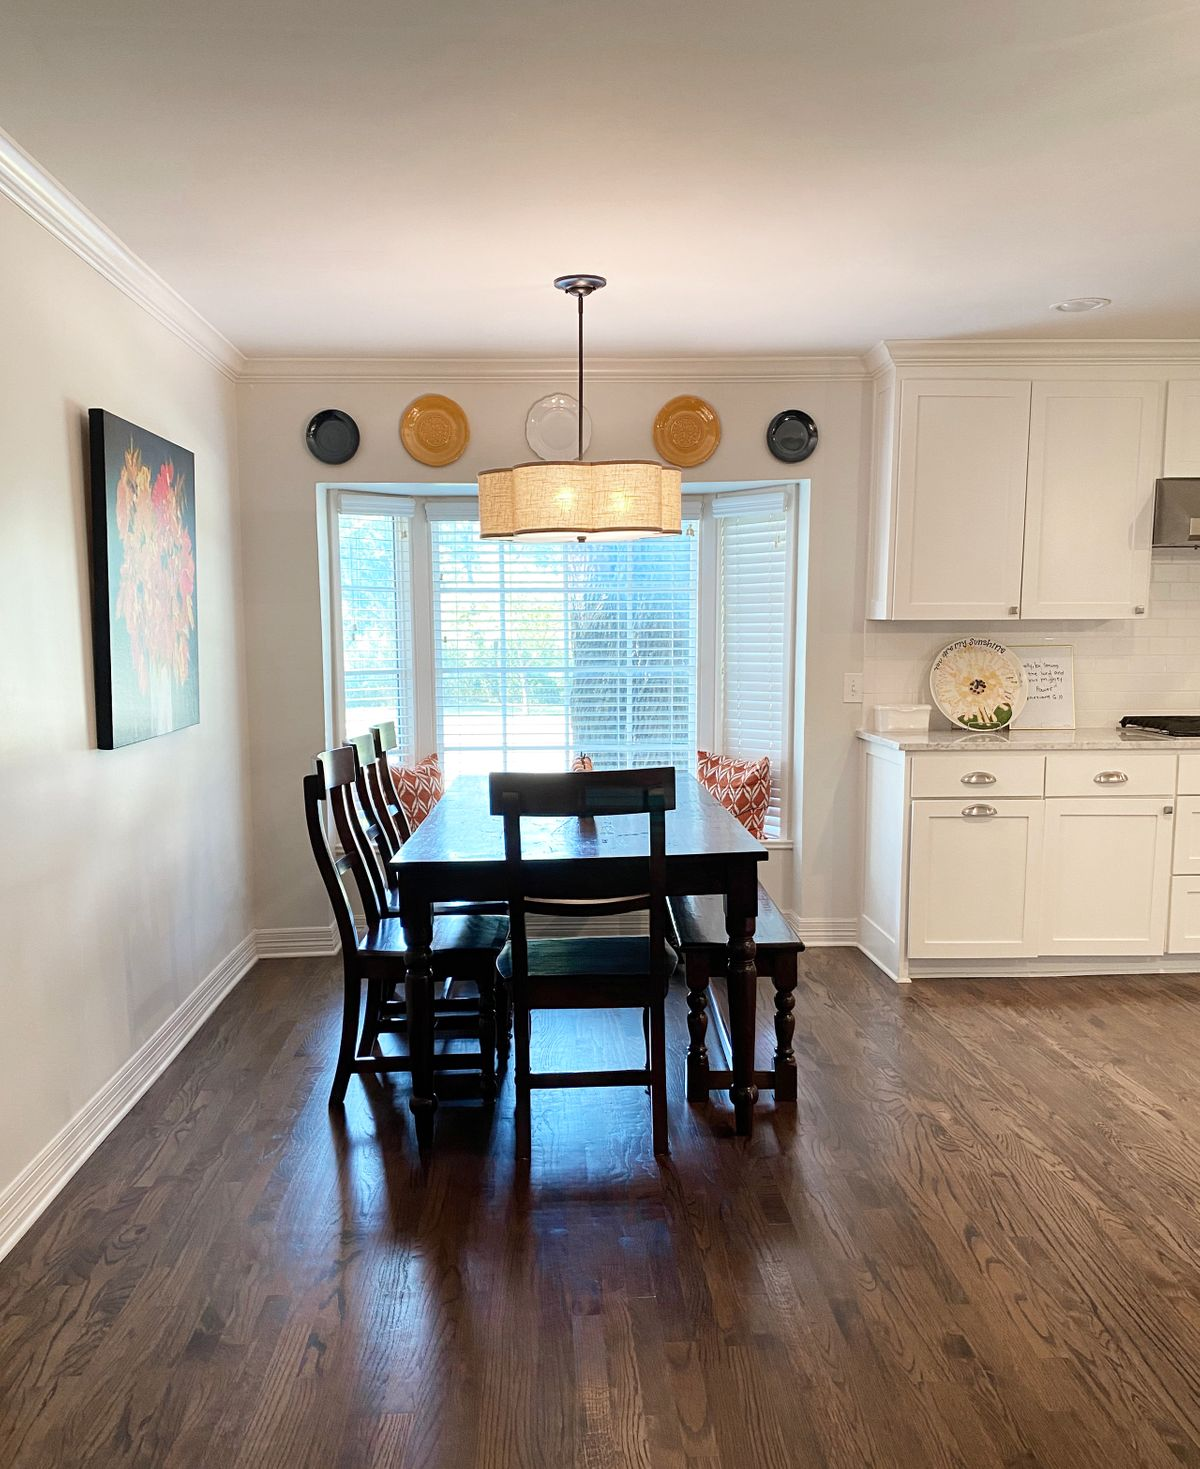 Amanda Traditional Home Photo Video Shoot Location Dallas 04.jpeg